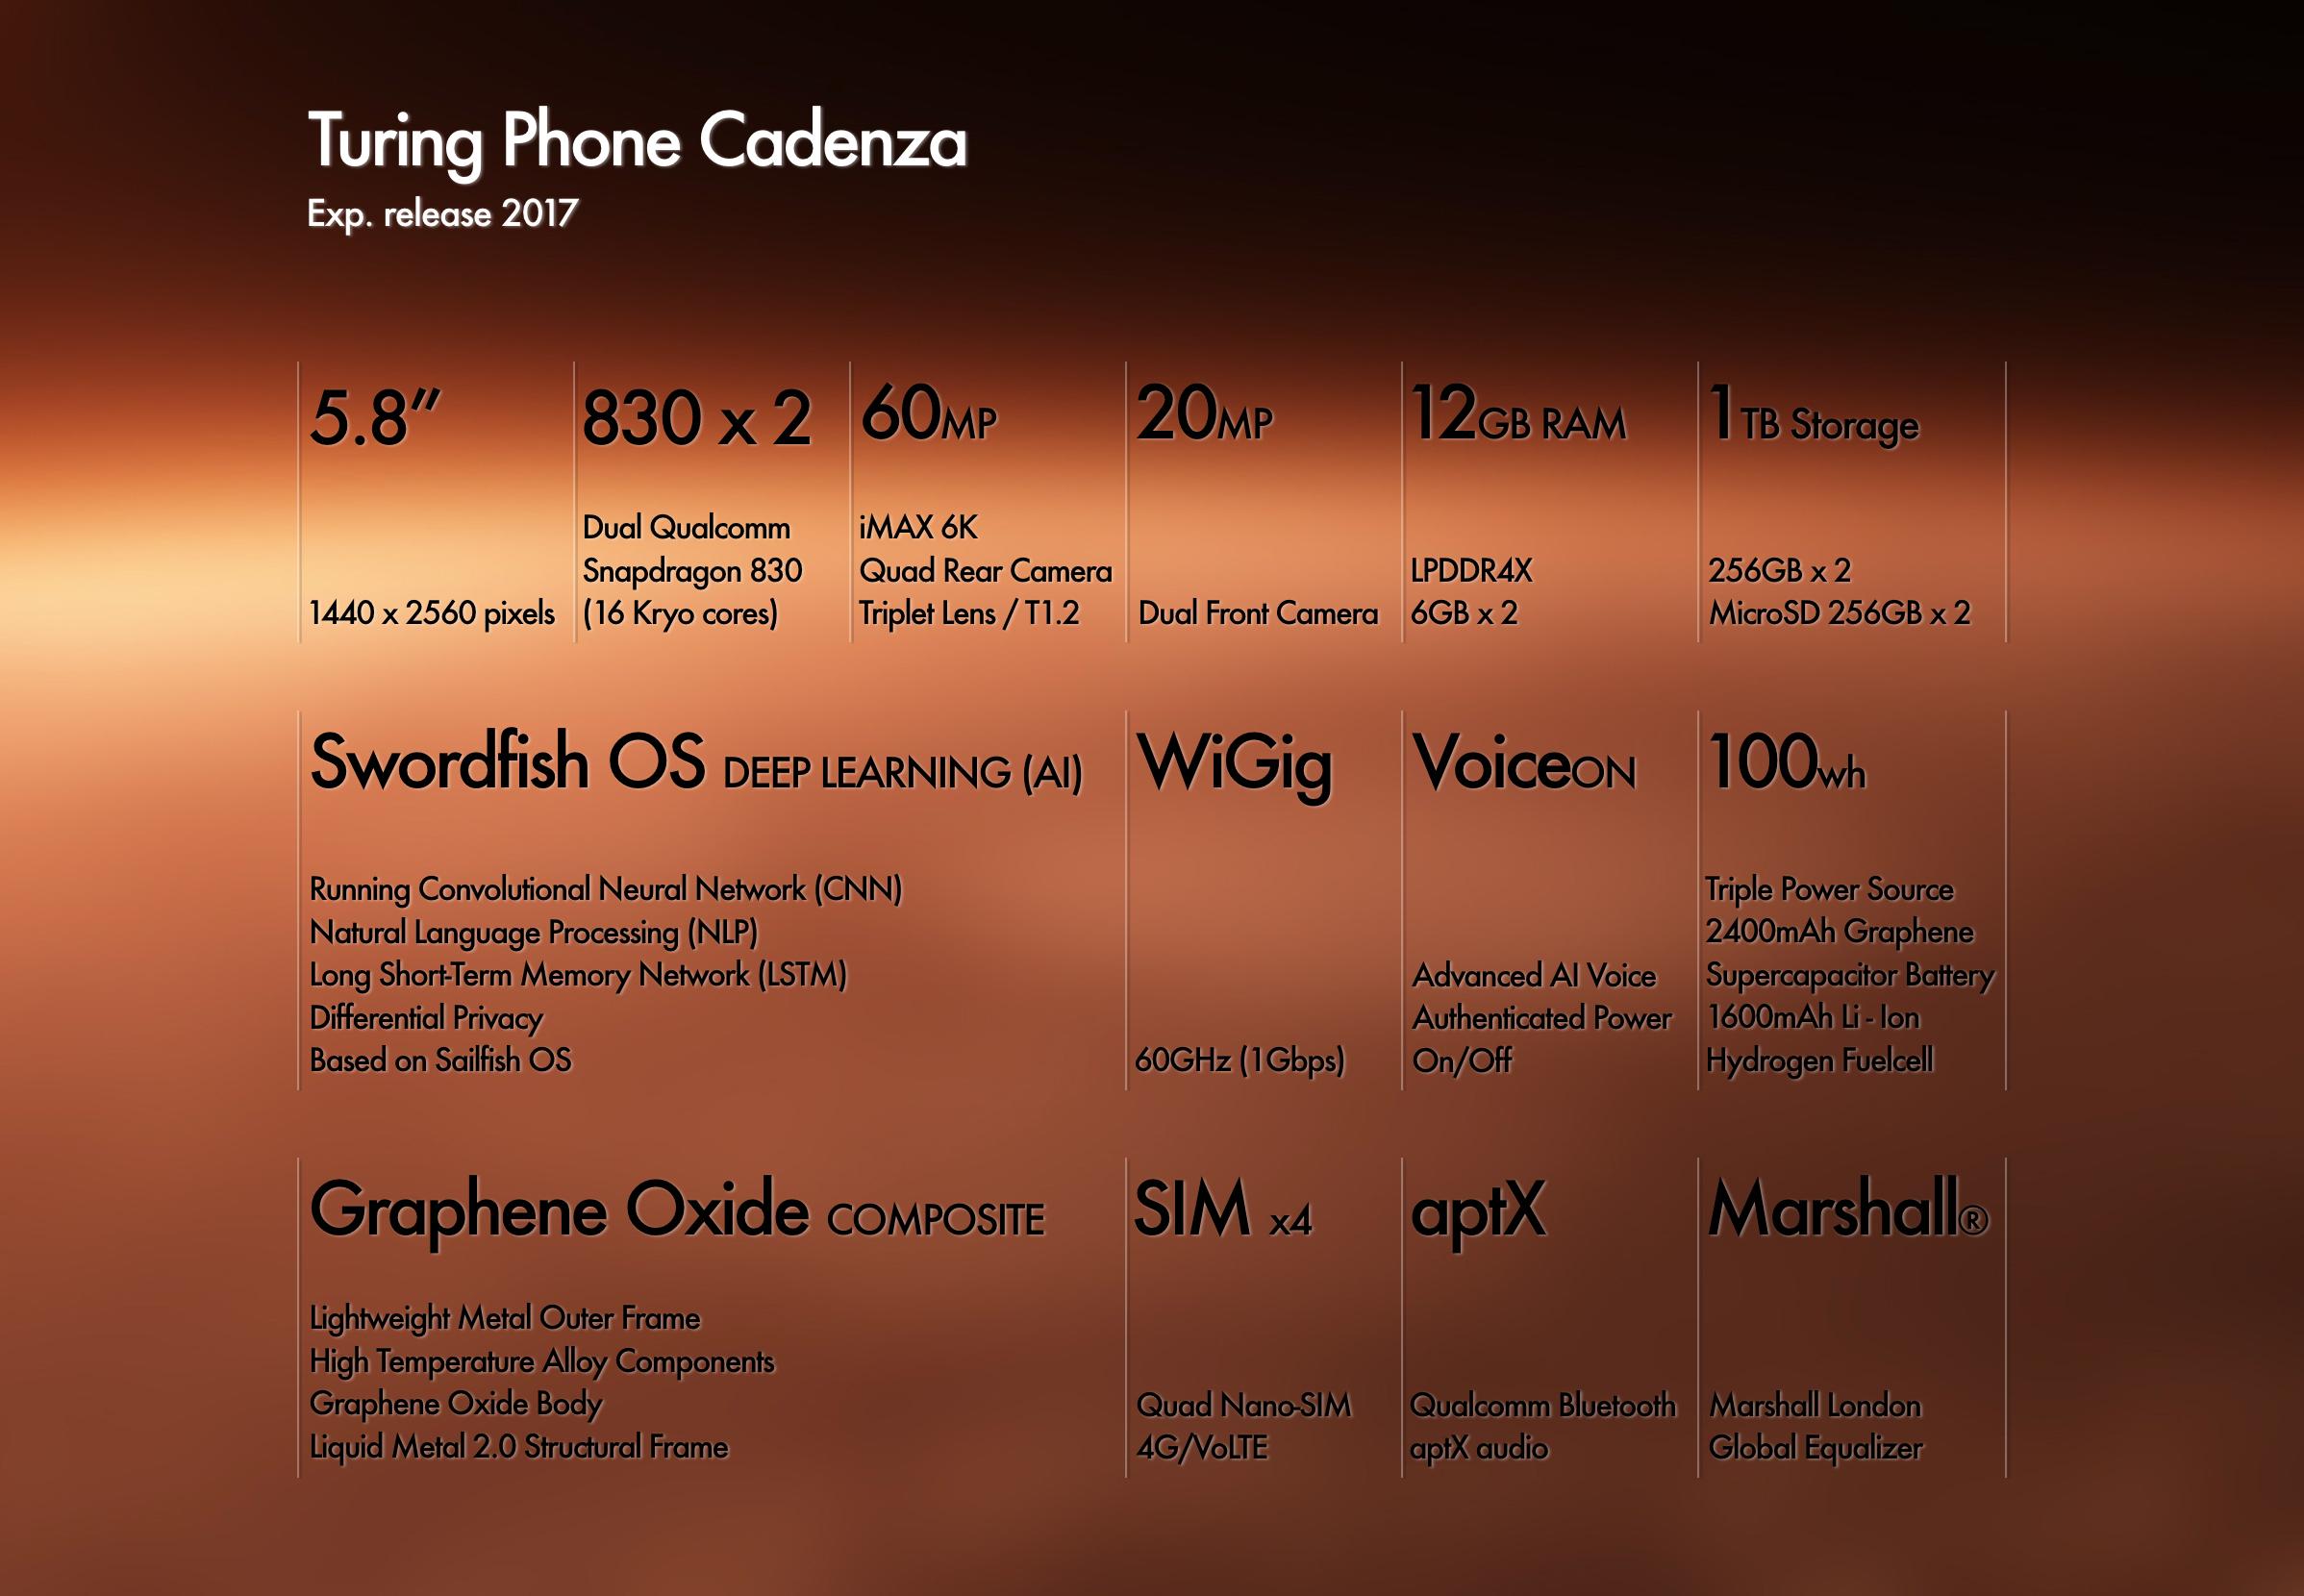 turing phone cadenza-1